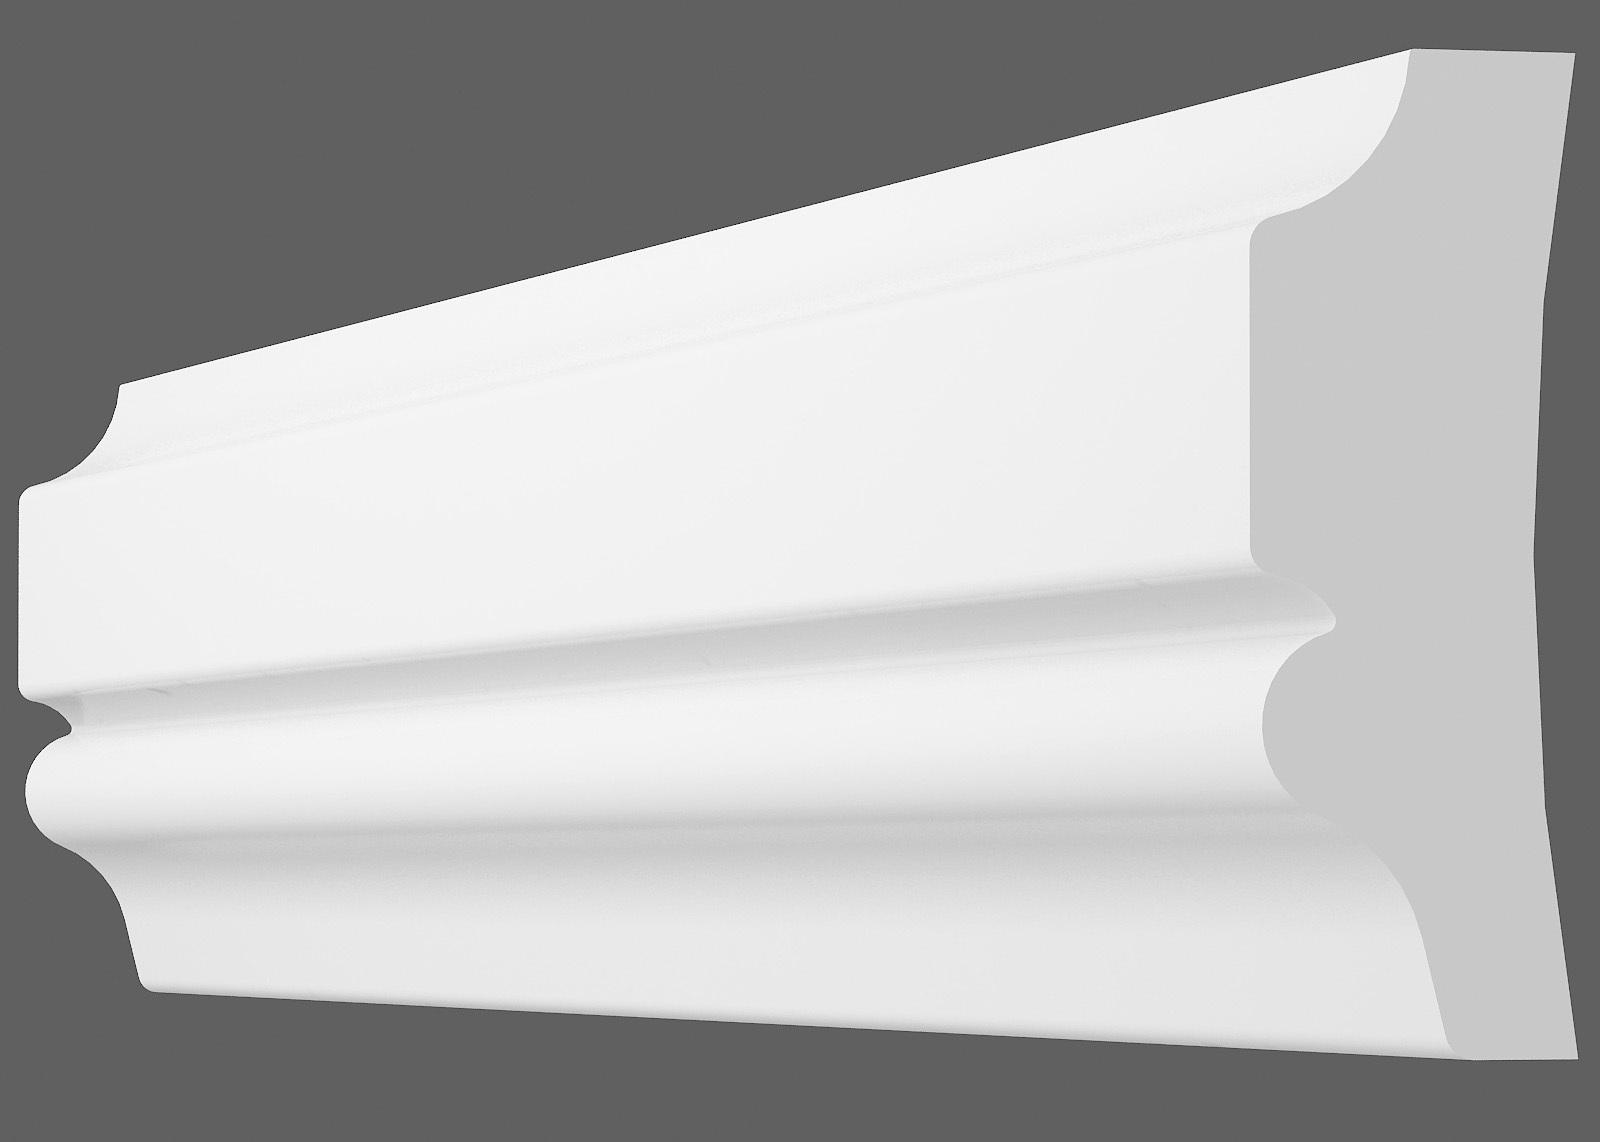 Потолочный плинтус U-35 (Размер:10х30мм)